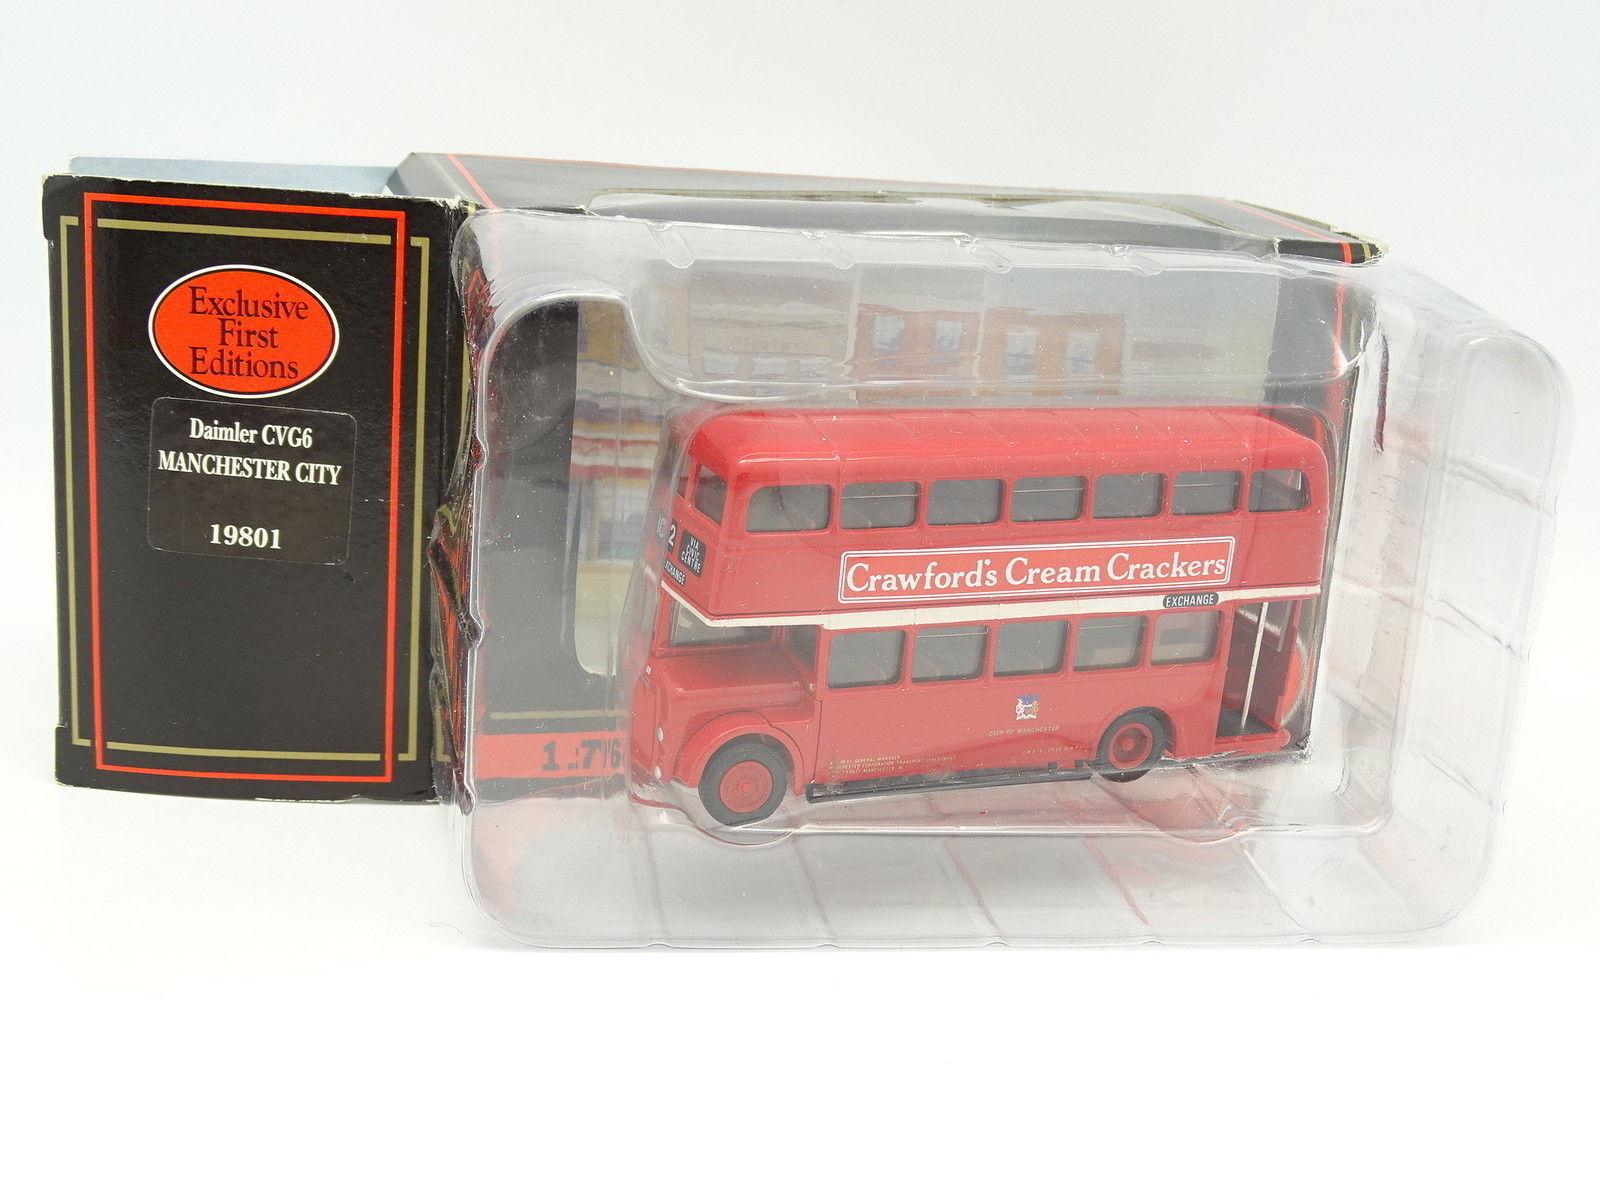 Gilbow 1 76 - - - Bus Autobús Daimler CVG6 Manchester b3cbb7